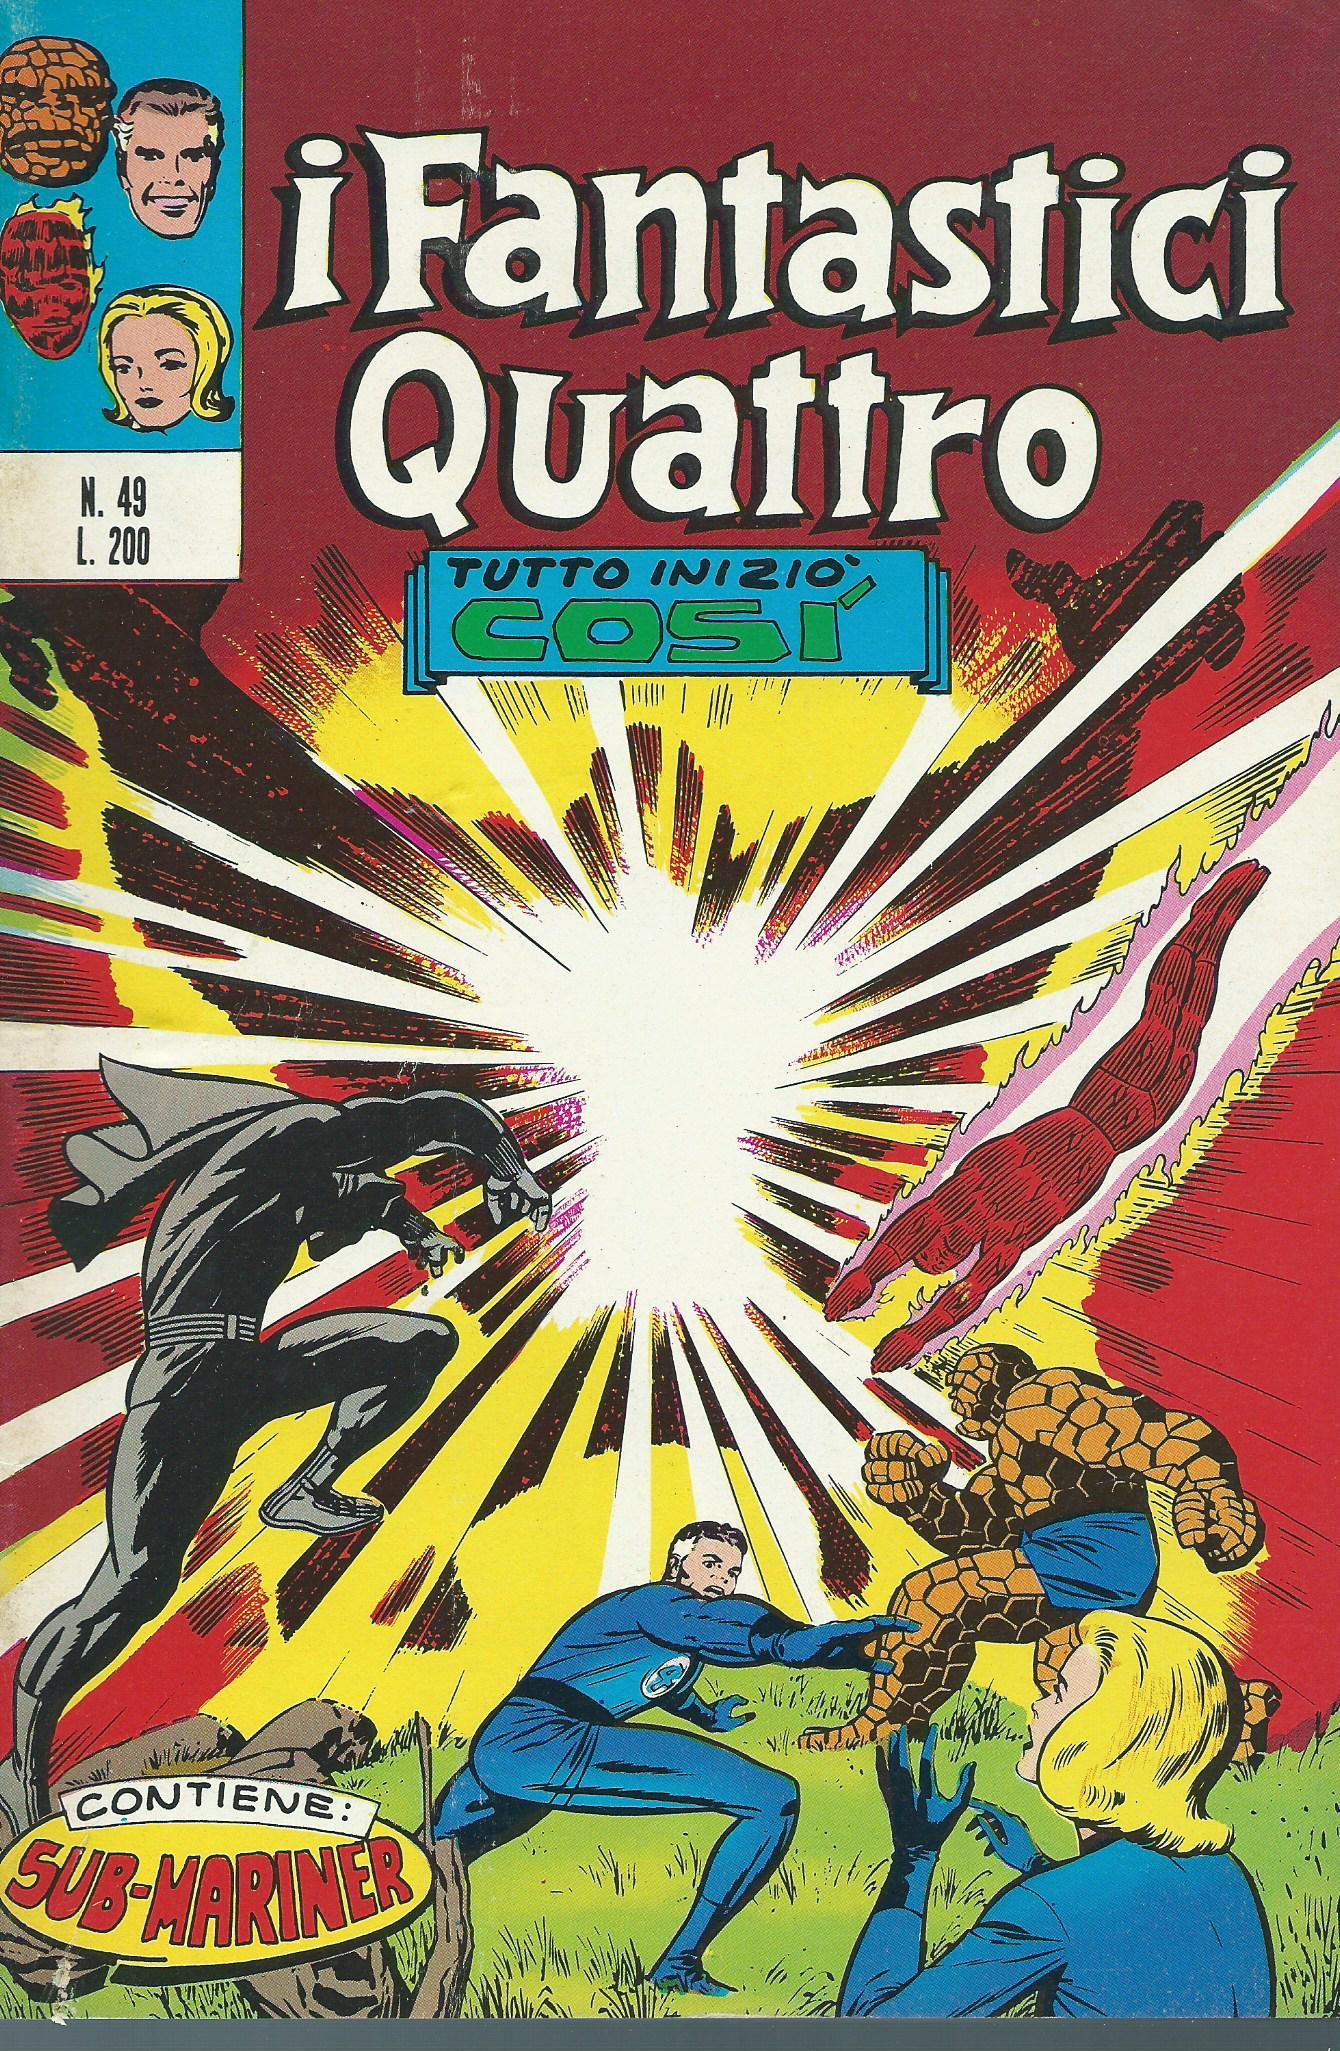 I Fantastici Quattro n. 49